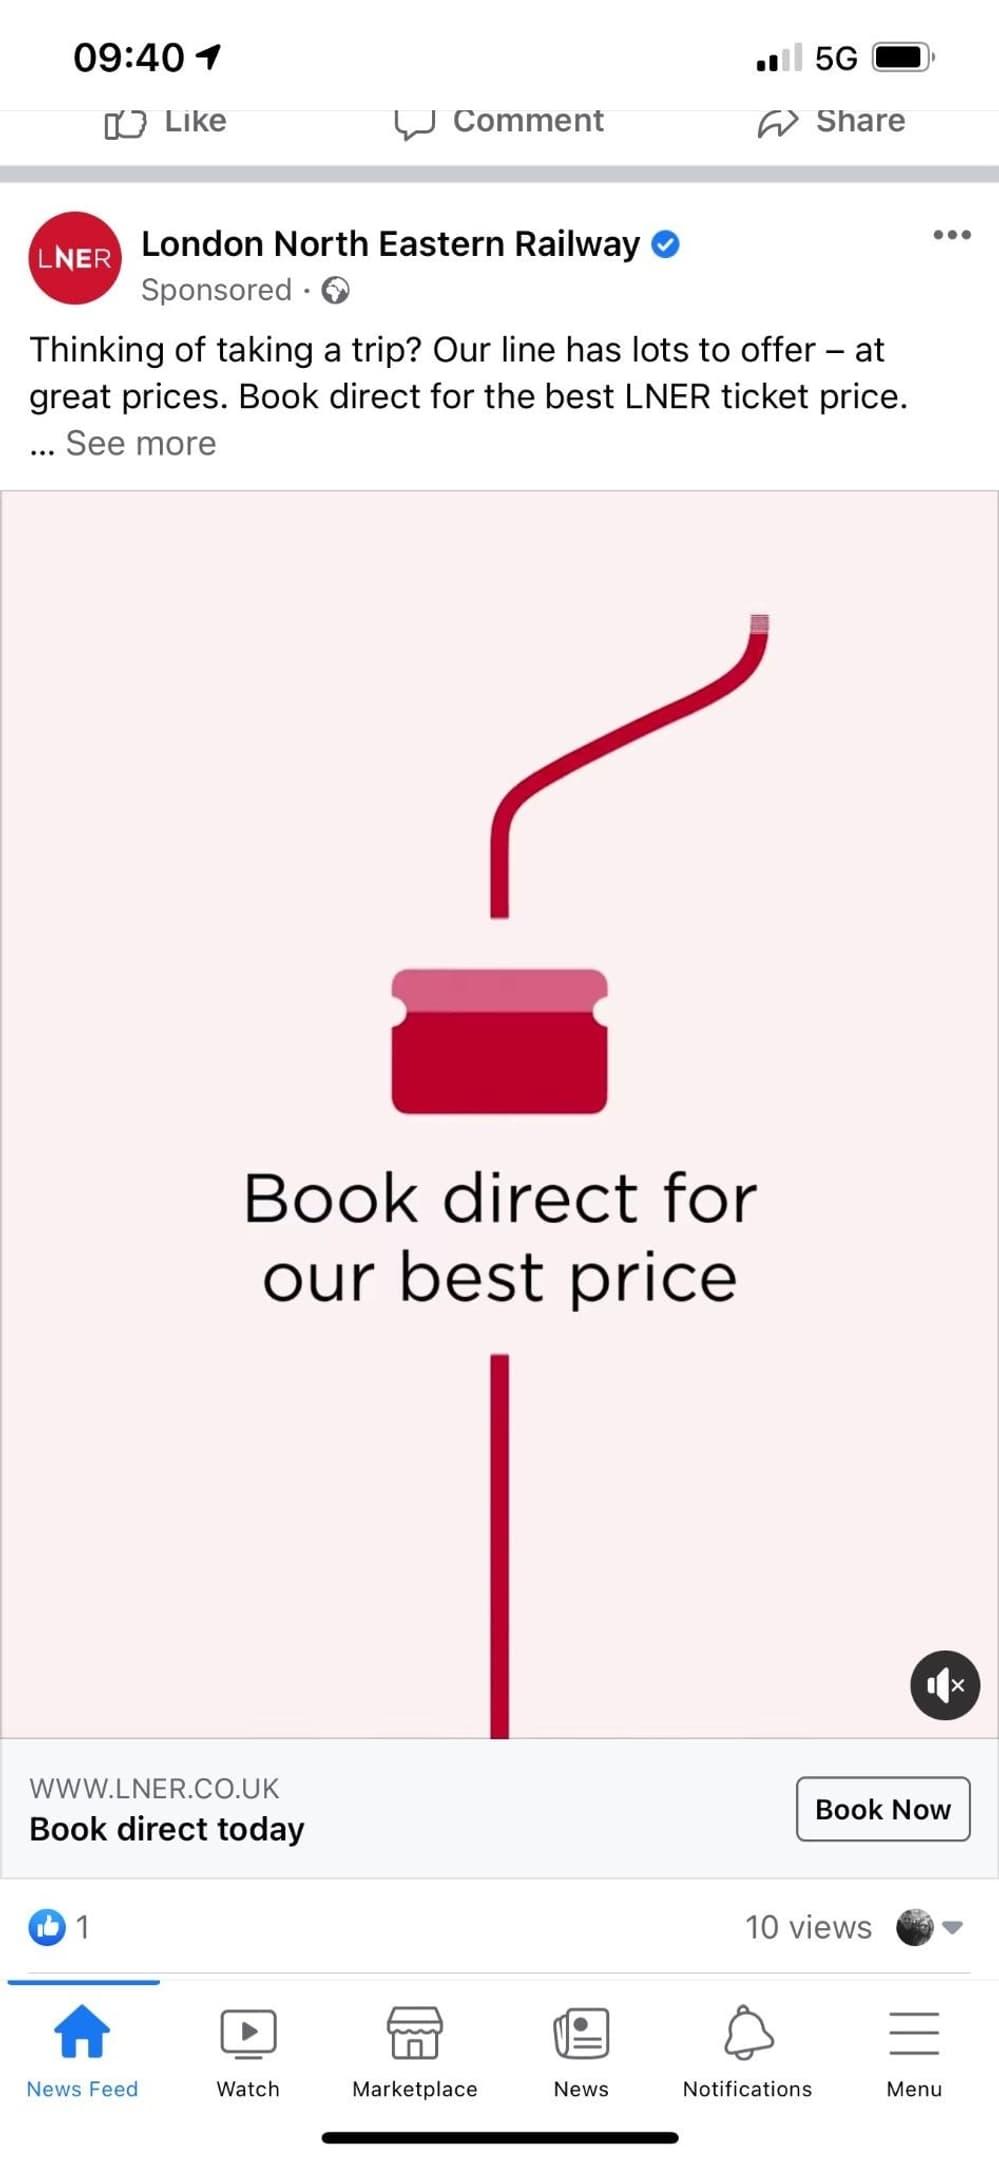 Retargeting ad examples travel brand